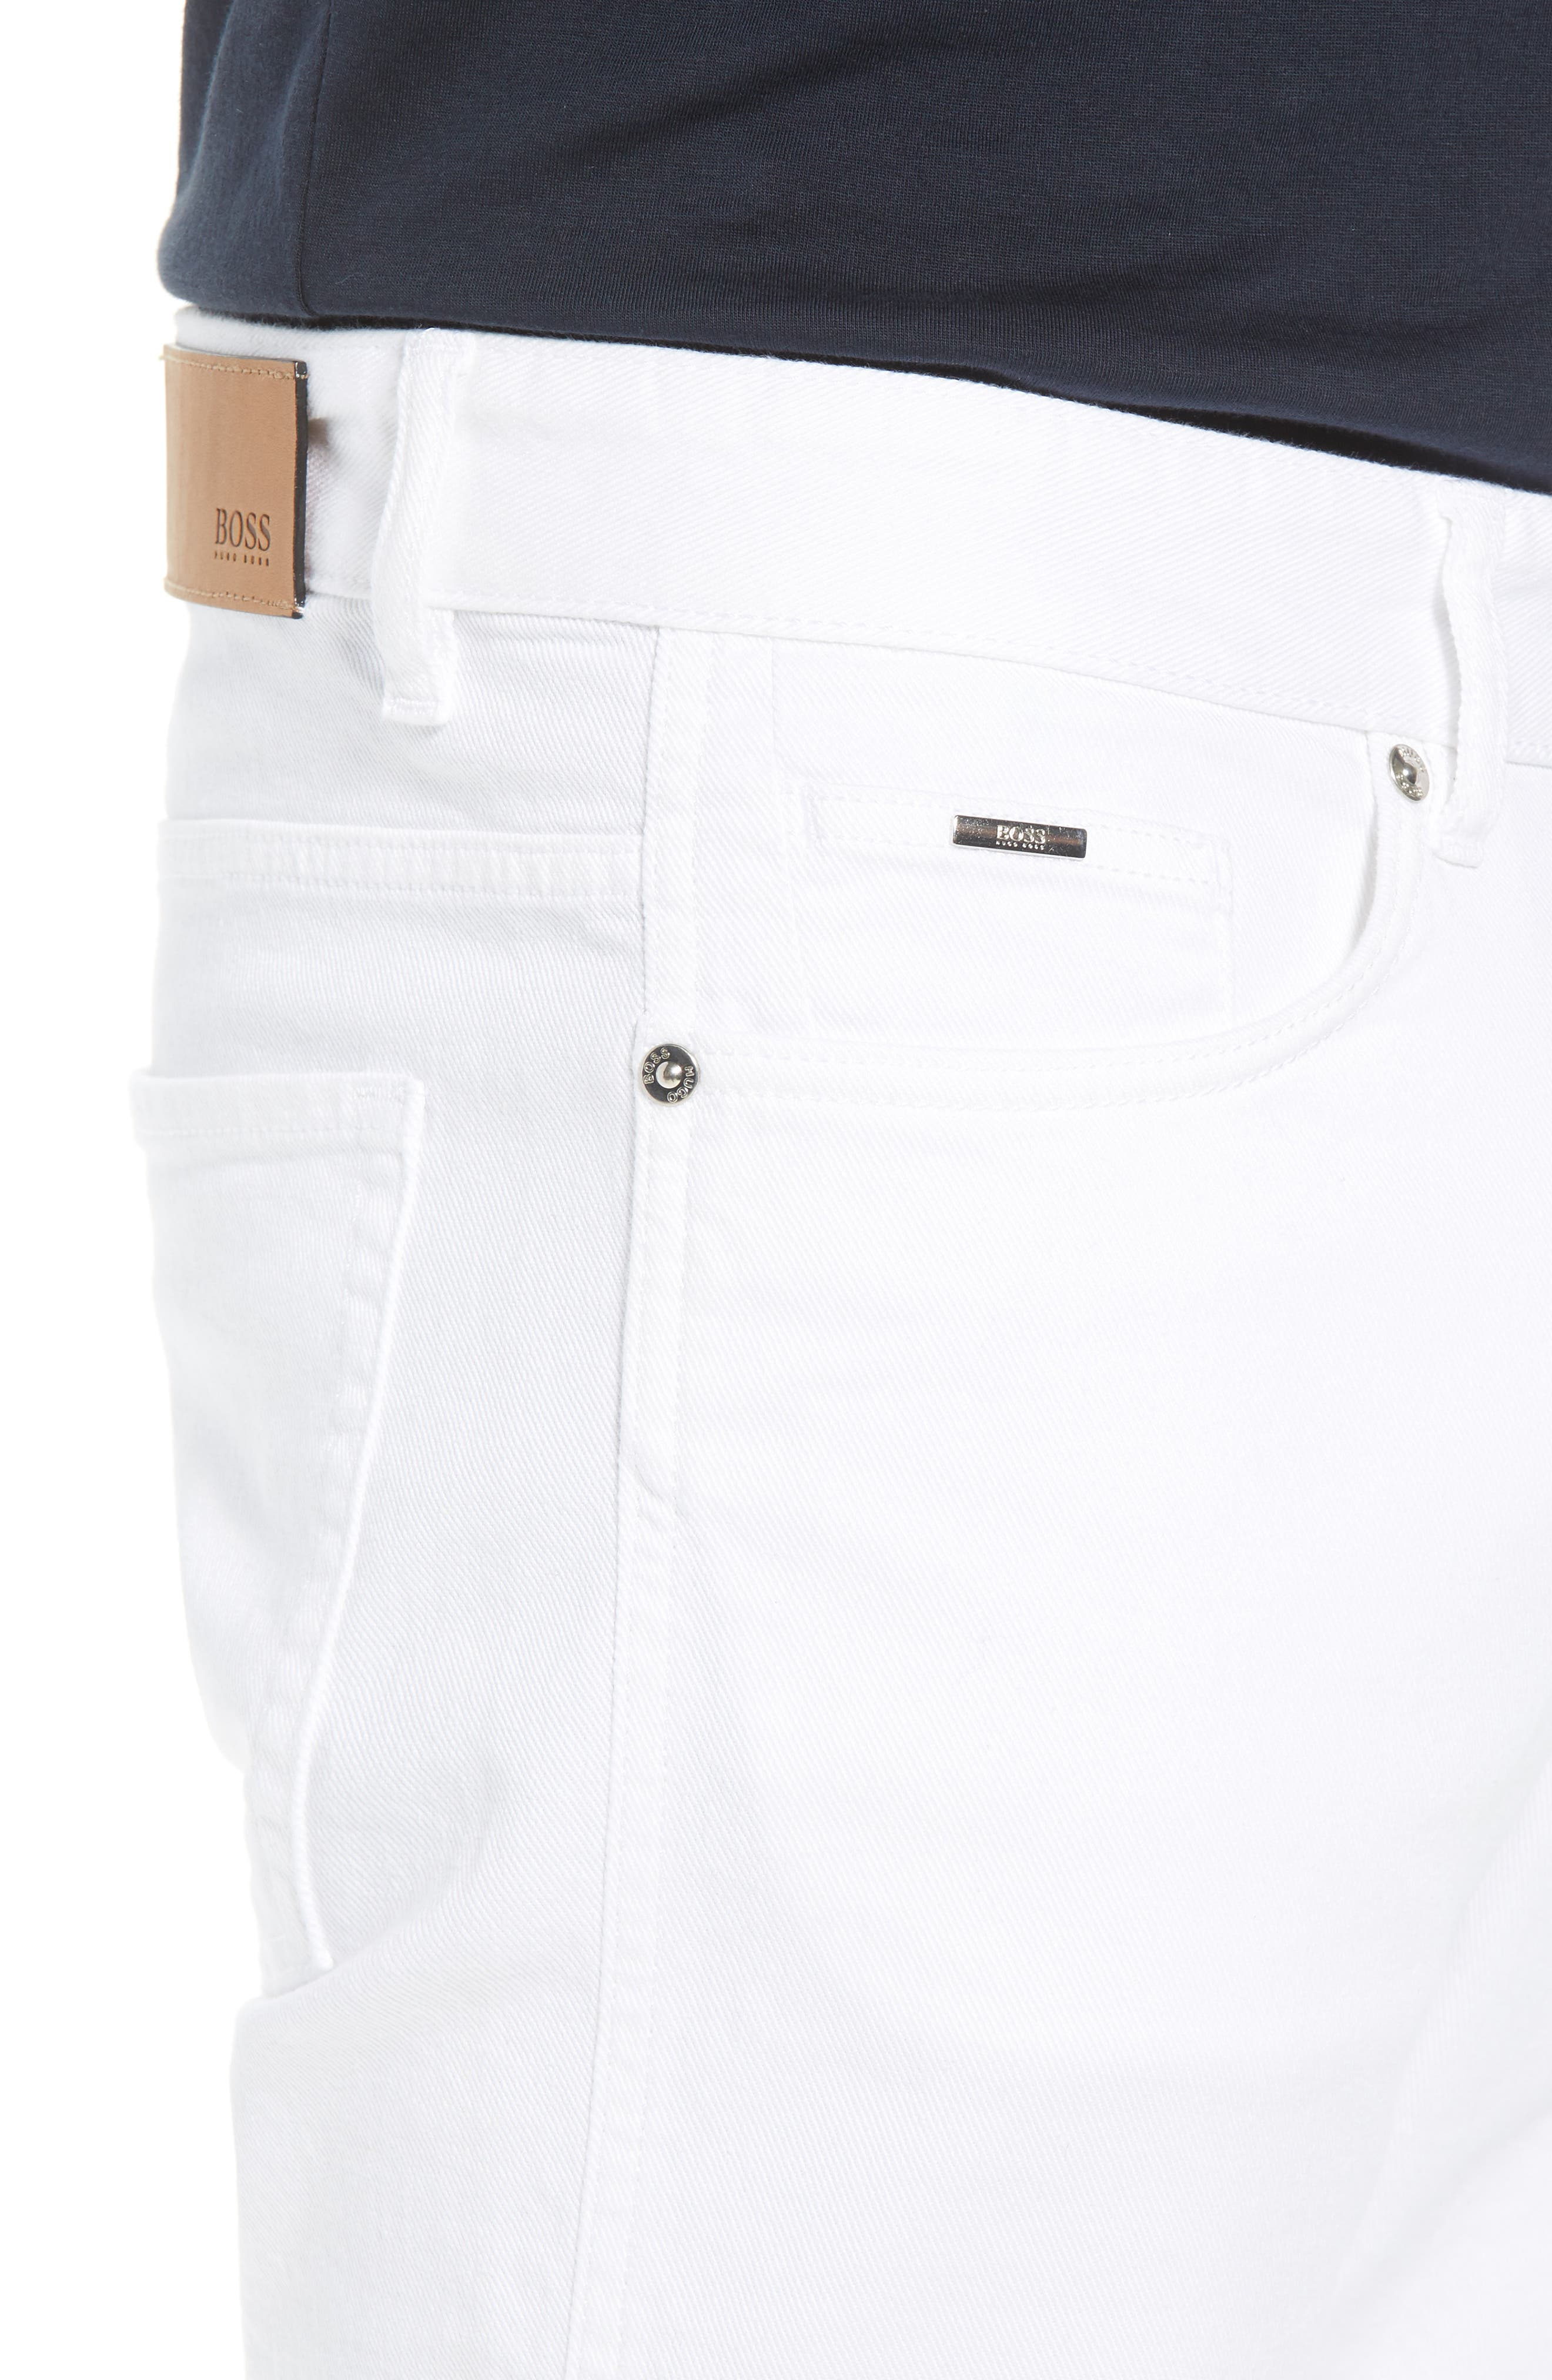 Delaware Slim Fit Jeans,                             Alternate thumbnail 4, color,                             White